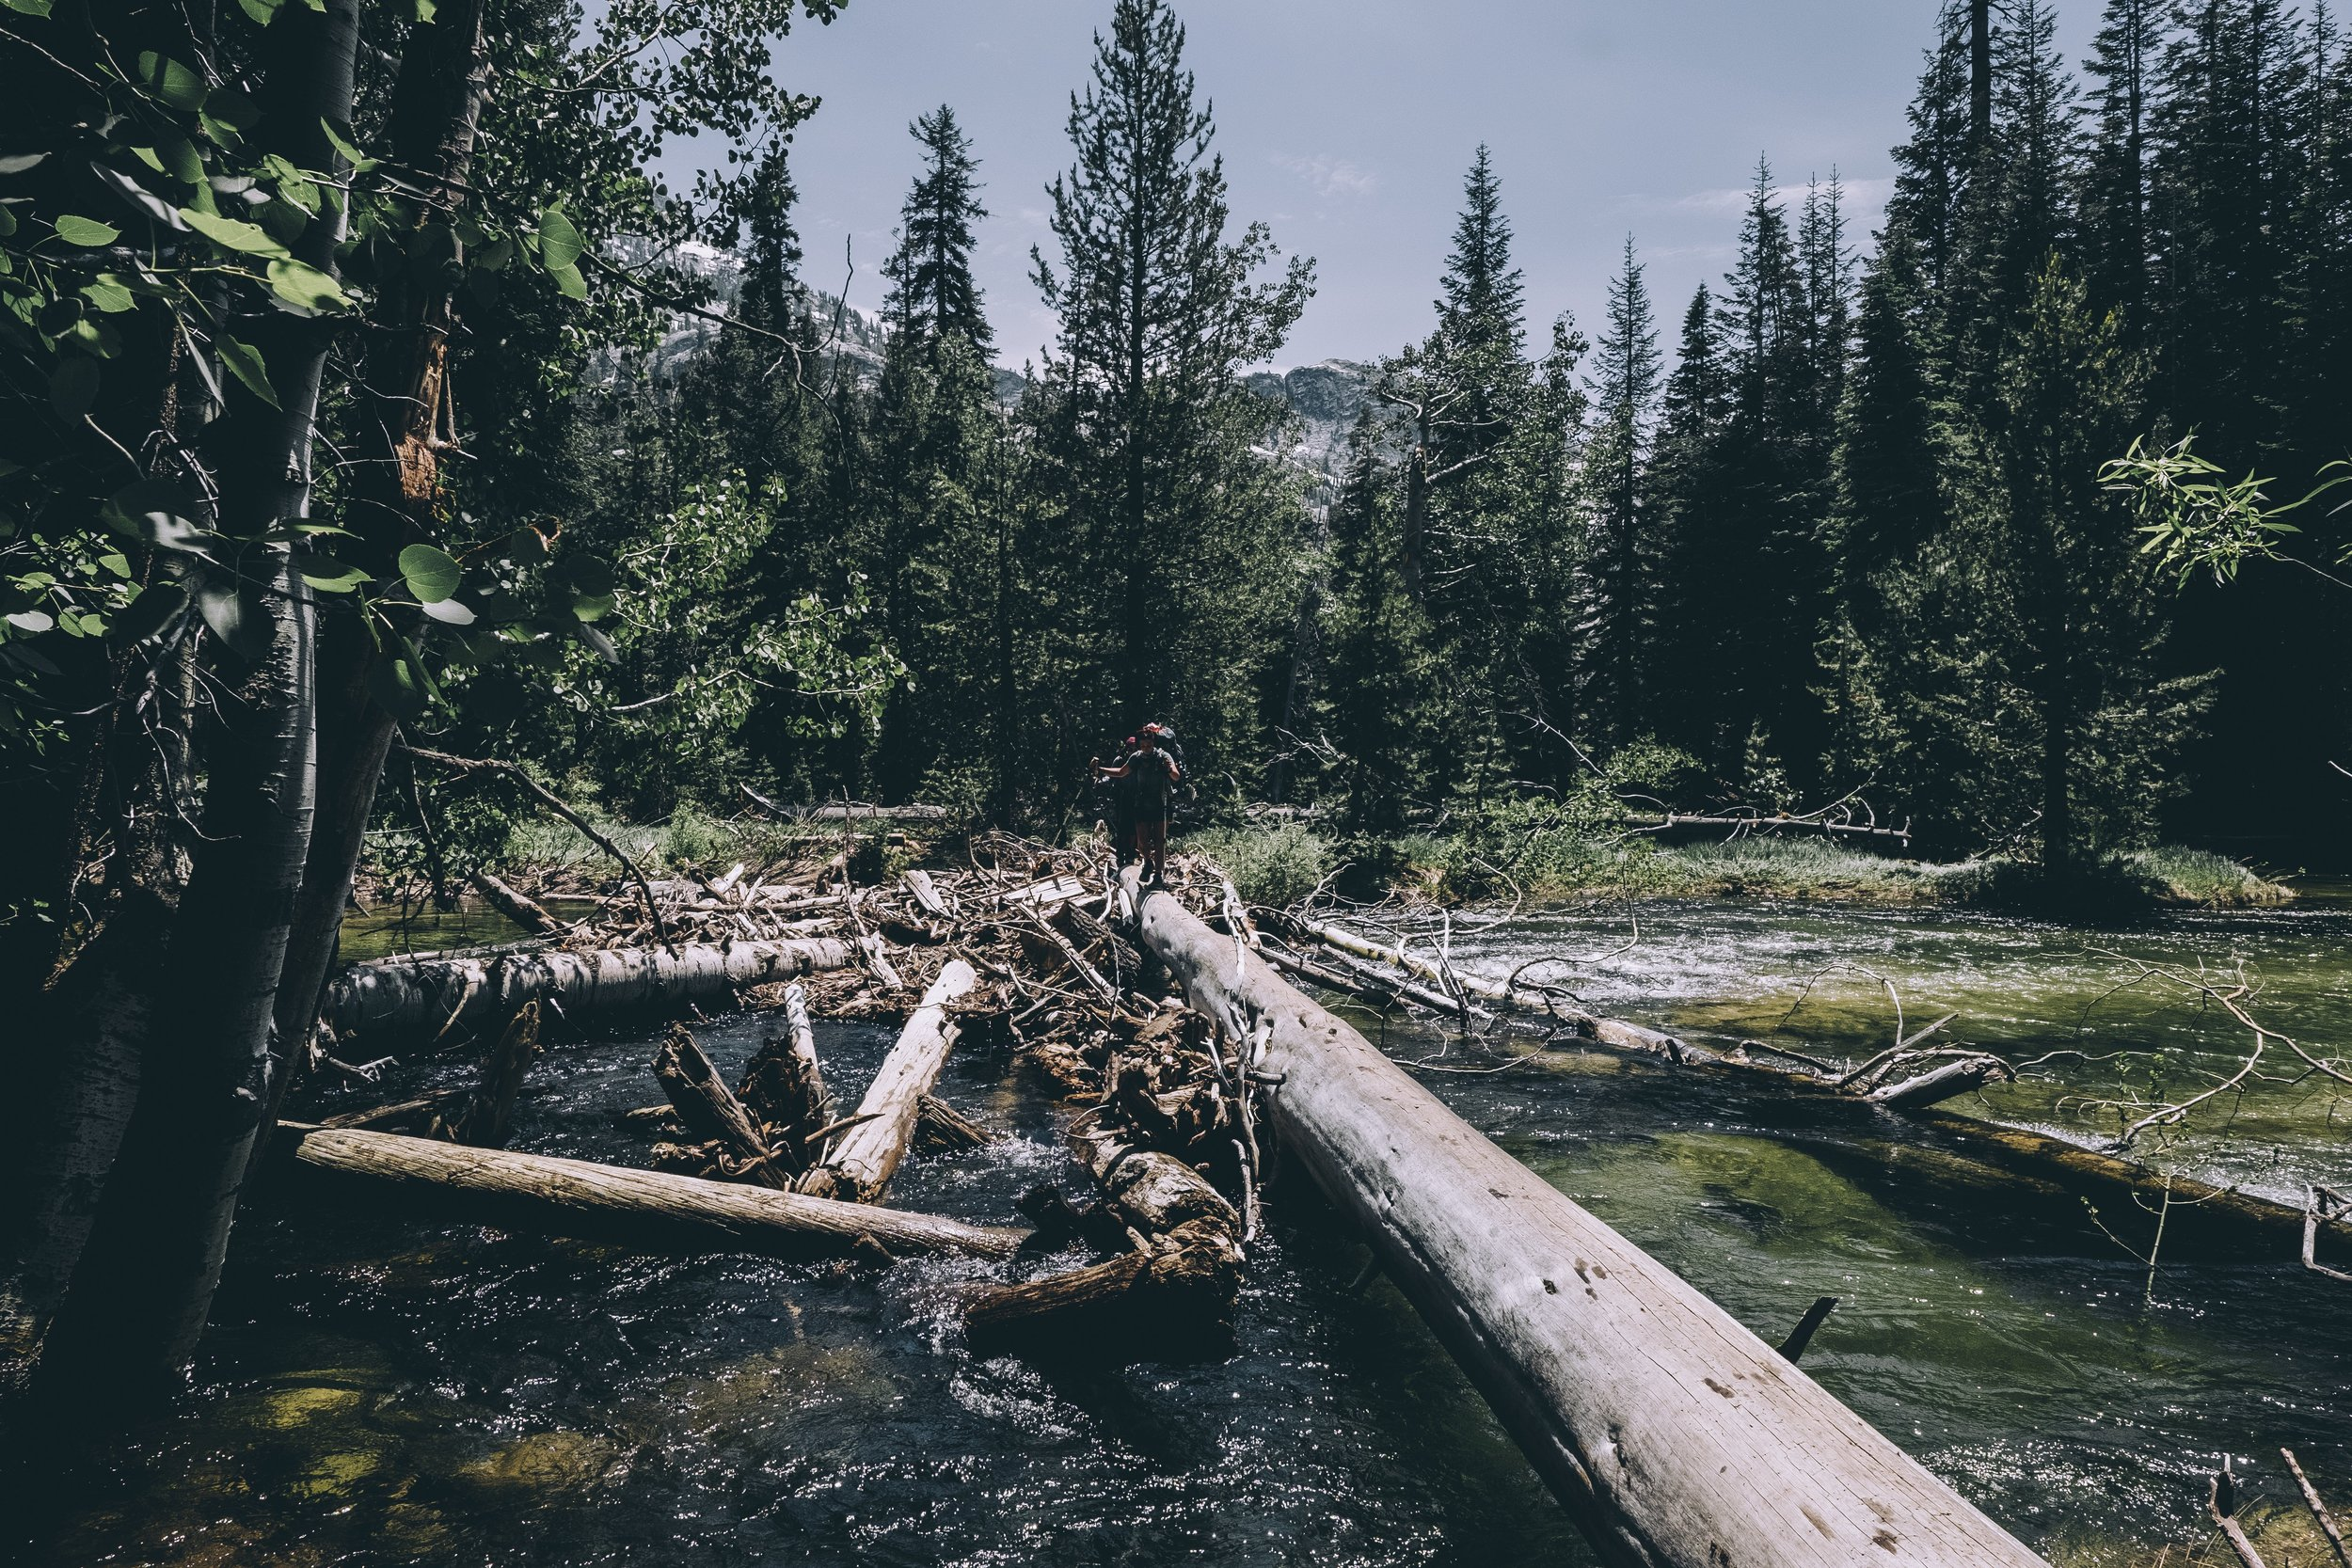 crossing a log on piute